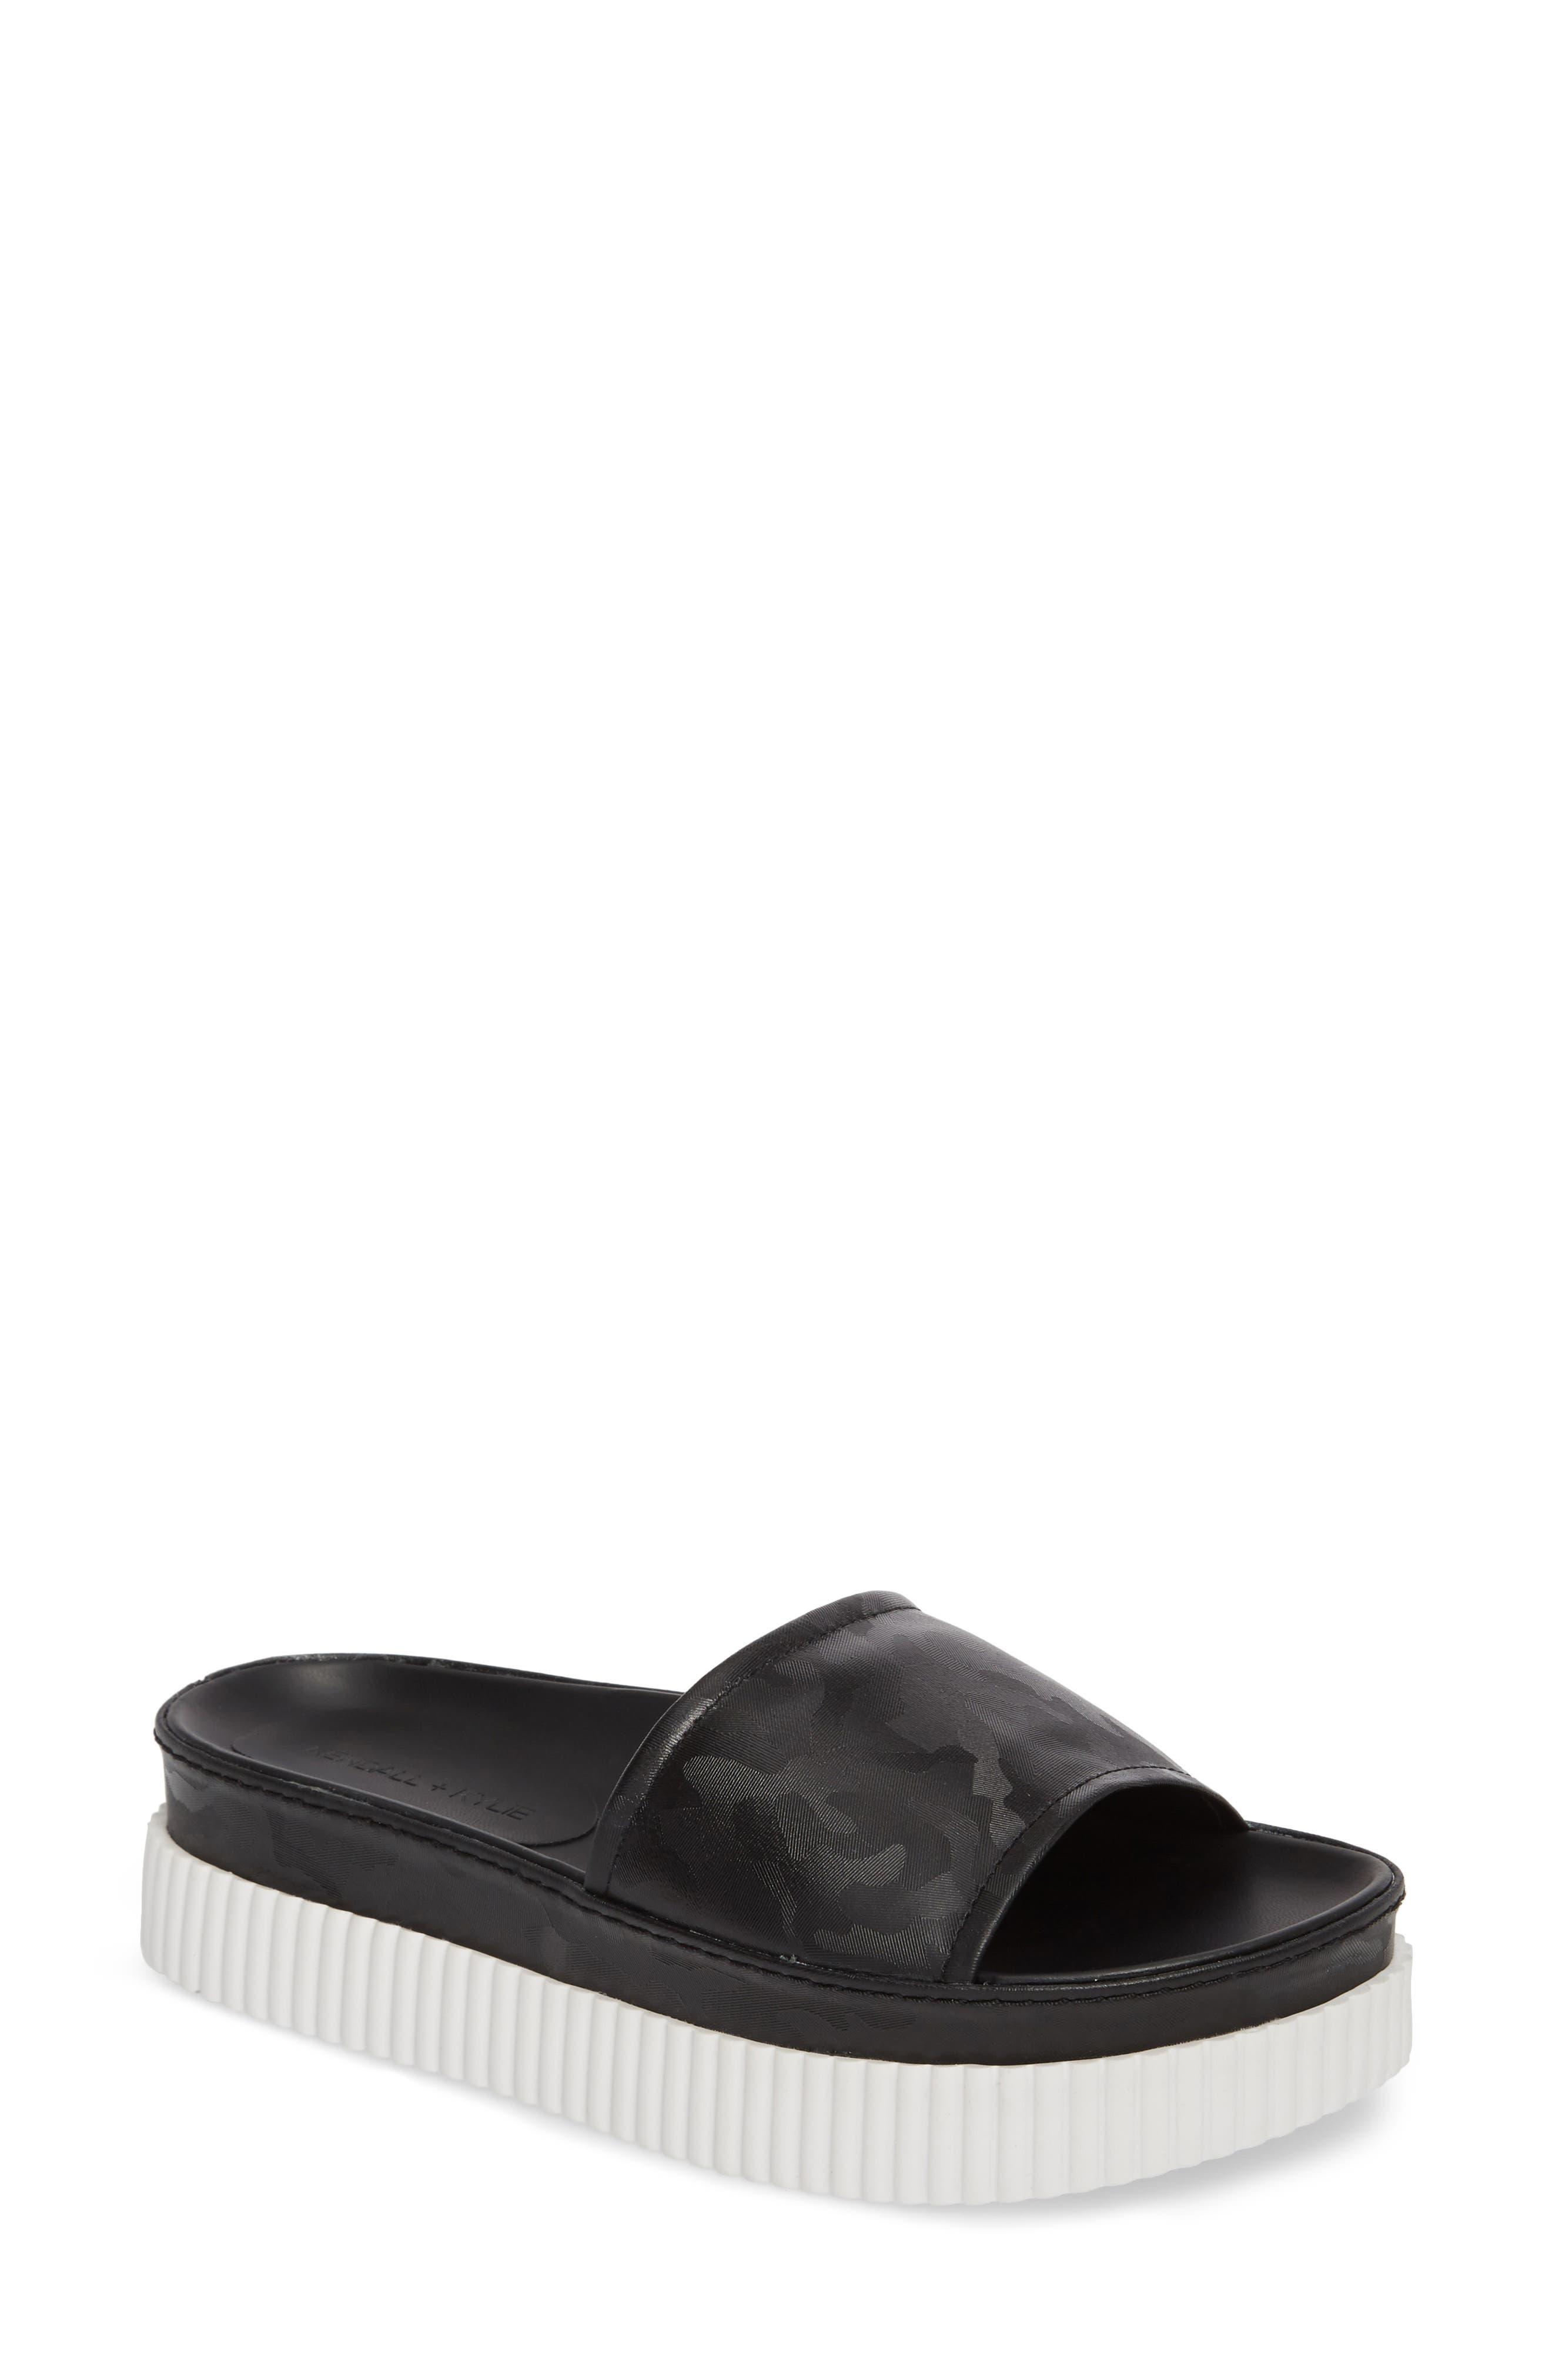 Isla Pool Slide Sandal,                         Main,                         color, Black/ Camo